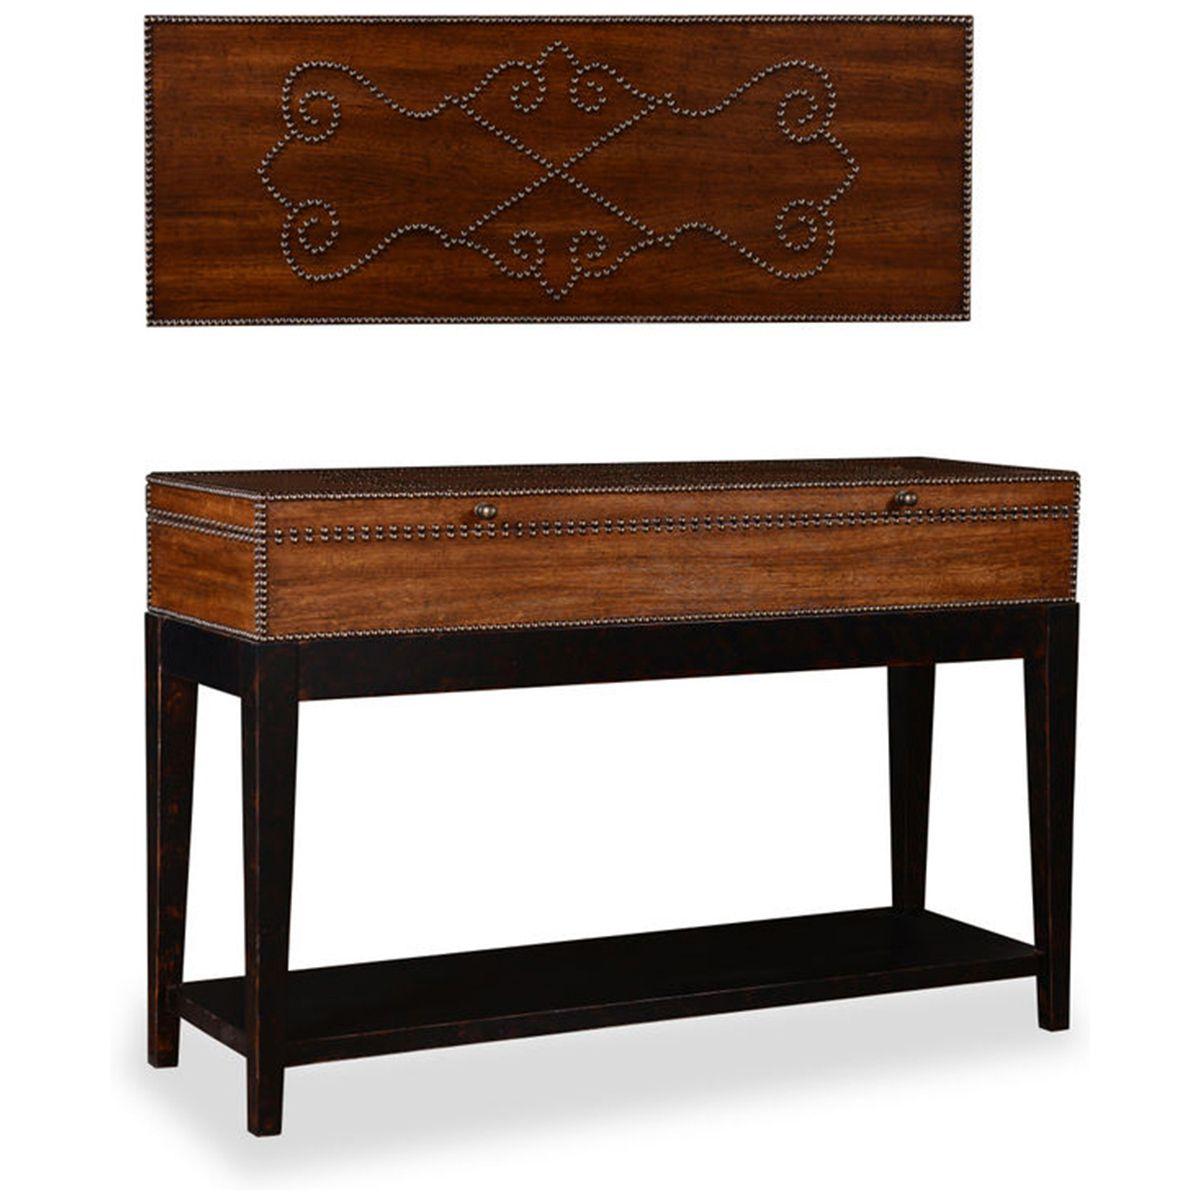 801324 2615 Console Table Art Furniture Living Furniture Howell Furniture [ 1200 x 1200 Pixel ]